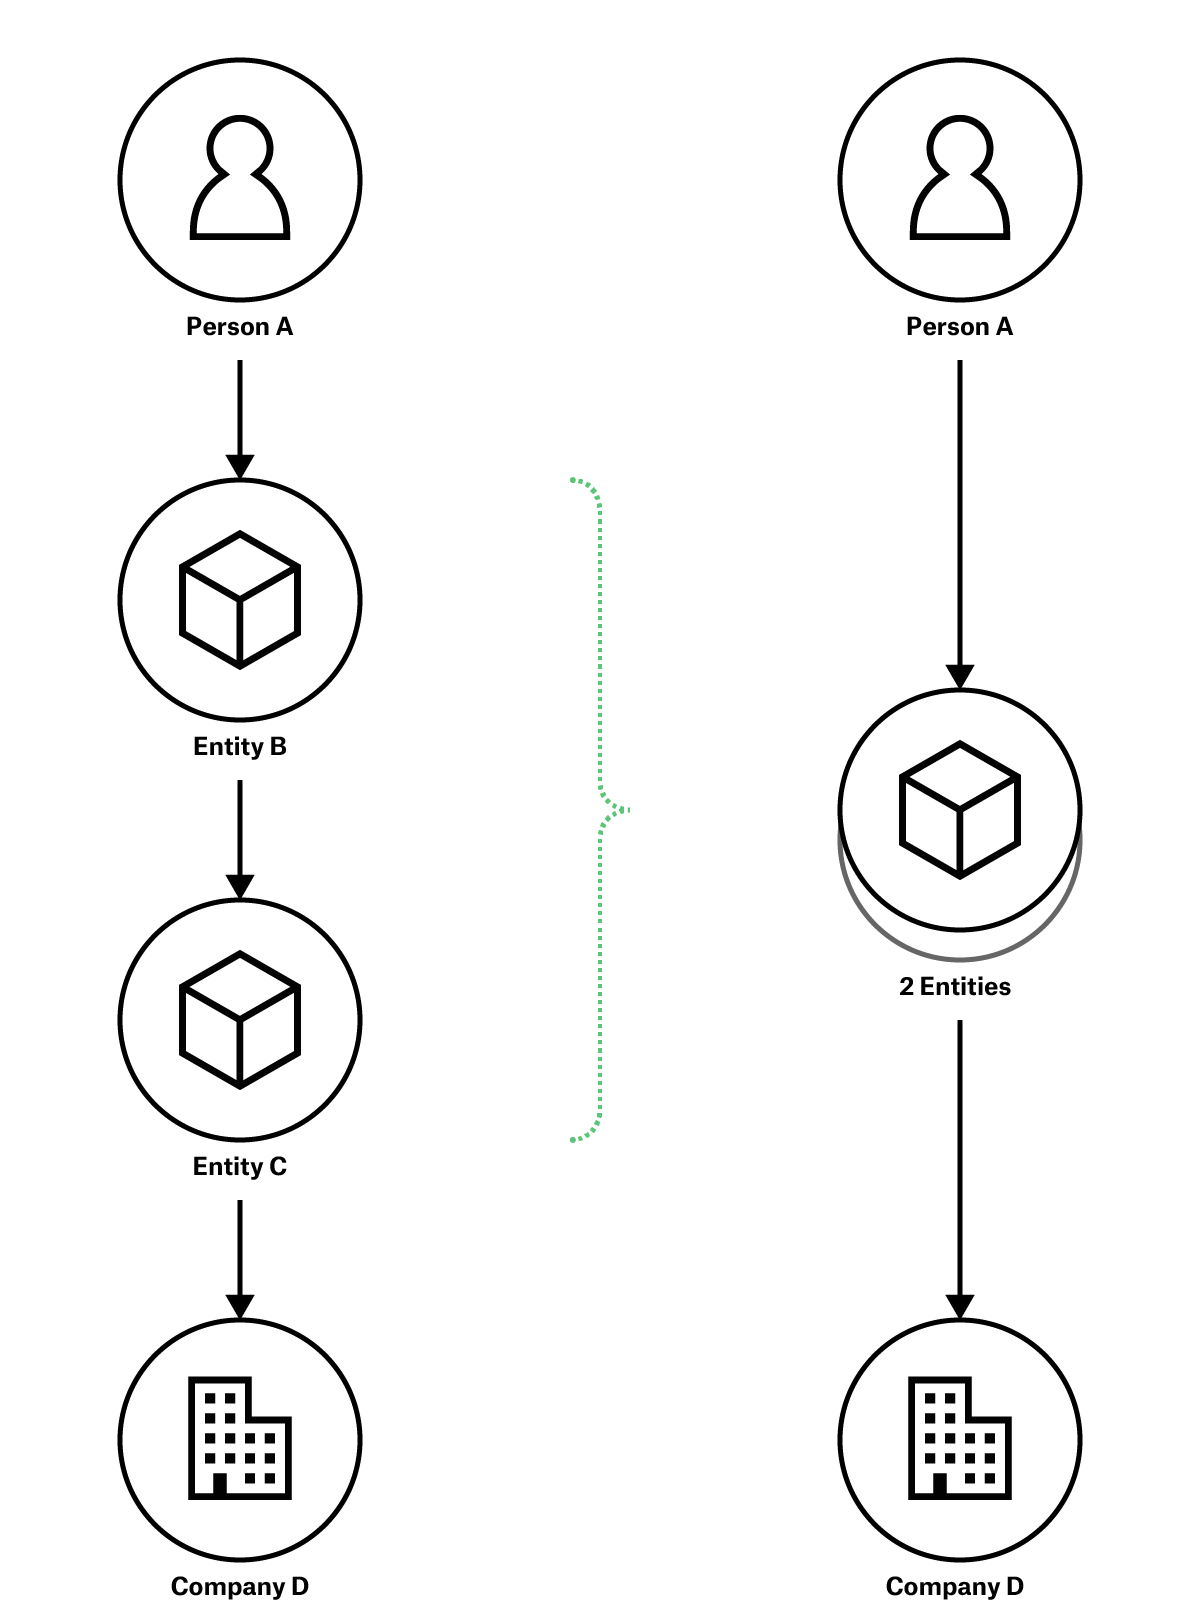 Entity Stack in a BOVS Diagram